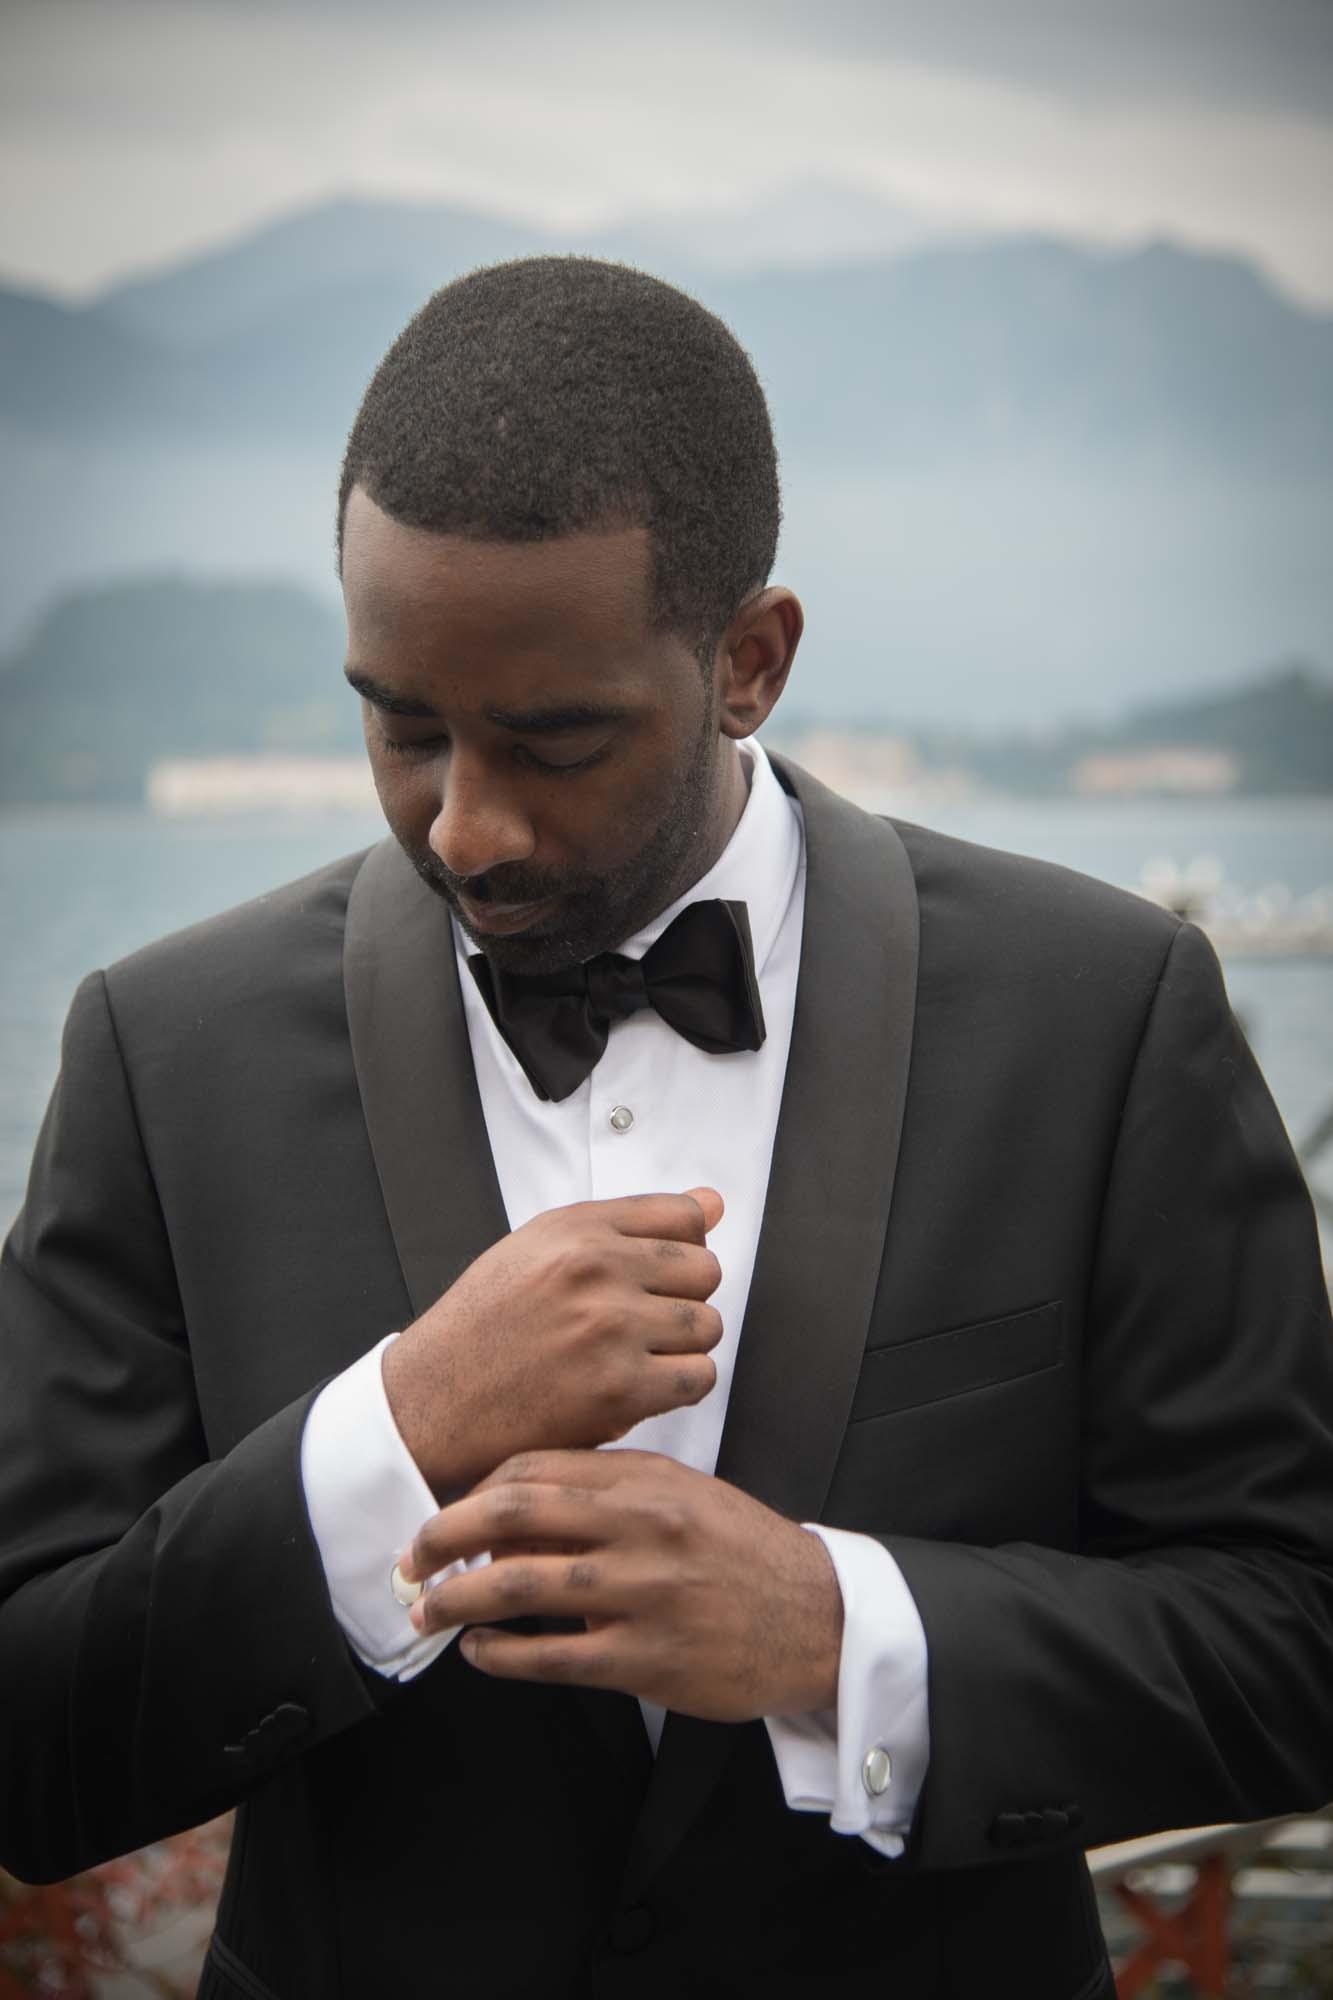 Lake-Como-Italy-Wedding-Jamie-Levine-Photography-2.jpg